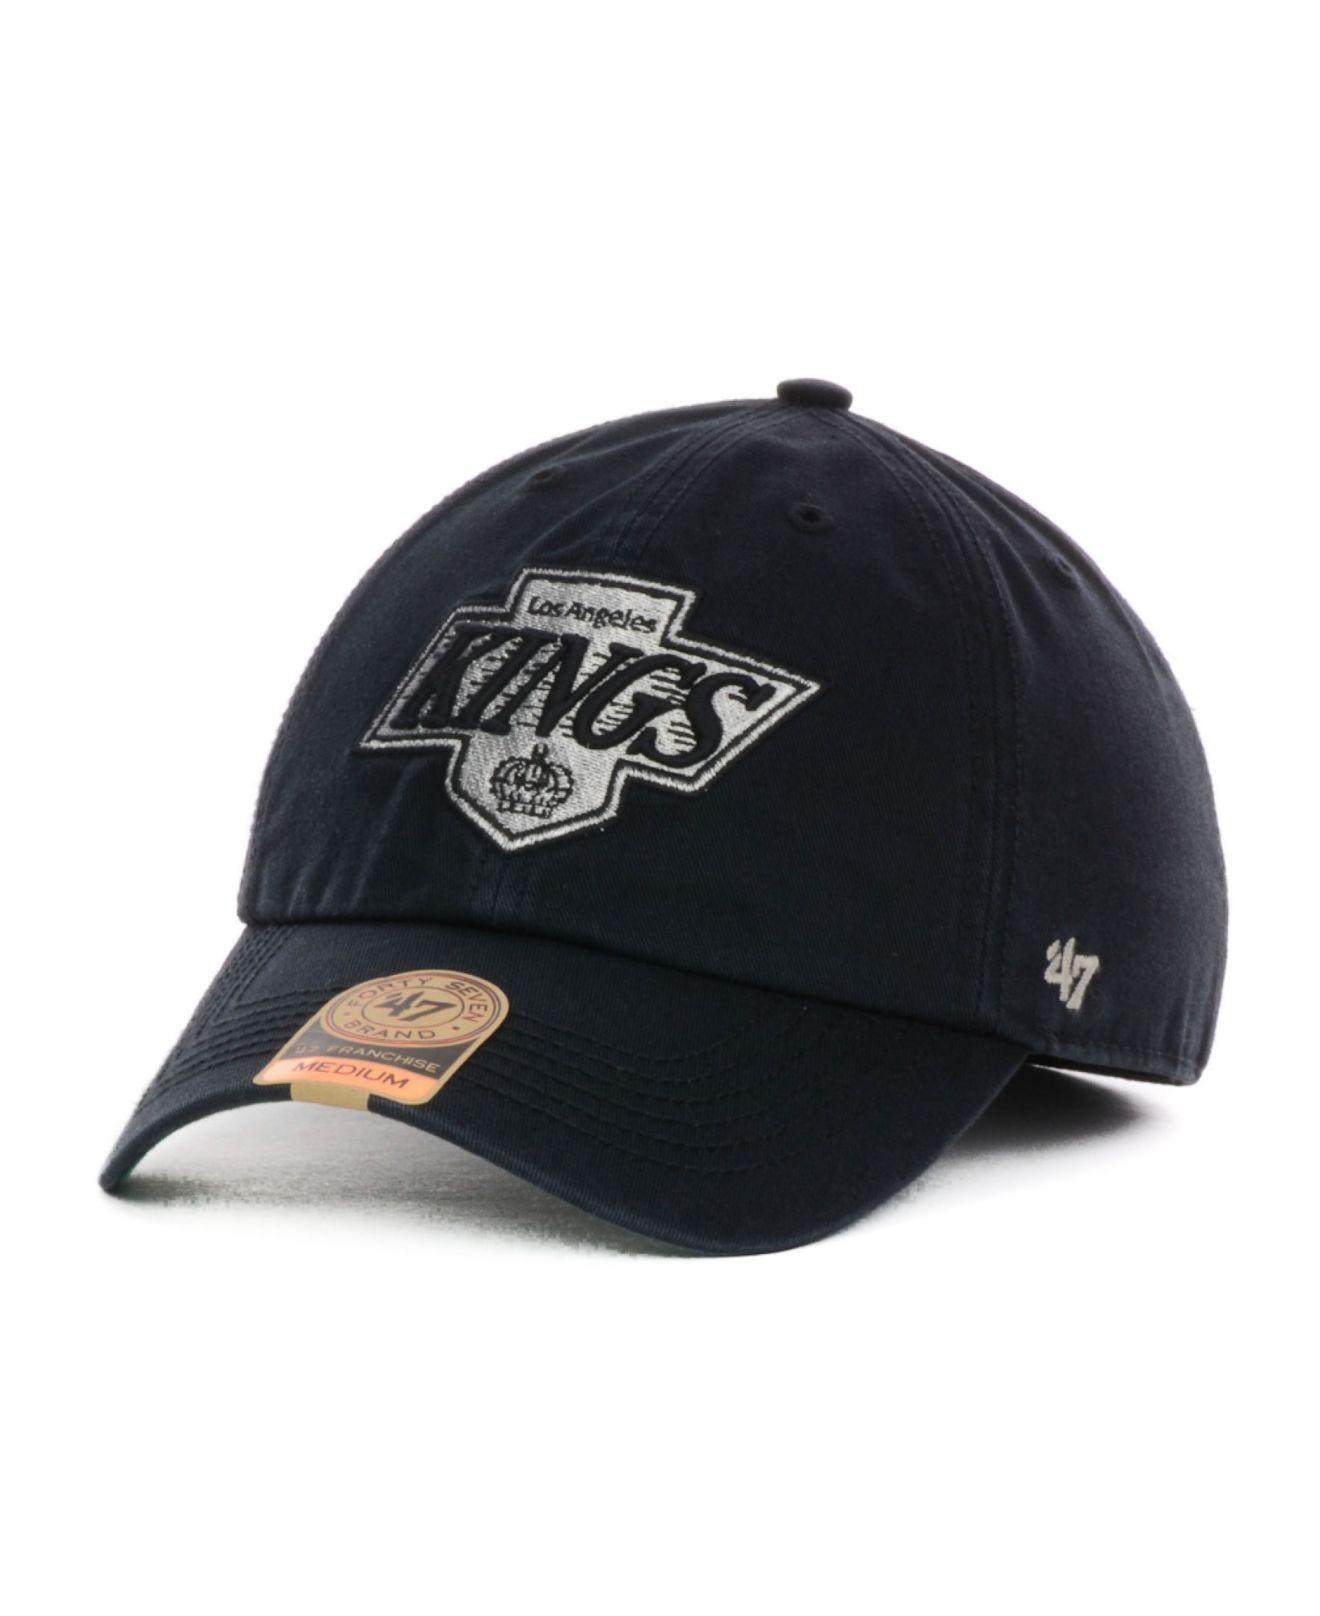 9f66c89d245c8 47 Brand Los Angeles Kings Vintage Franchise Cap in Black for Men - Lyst